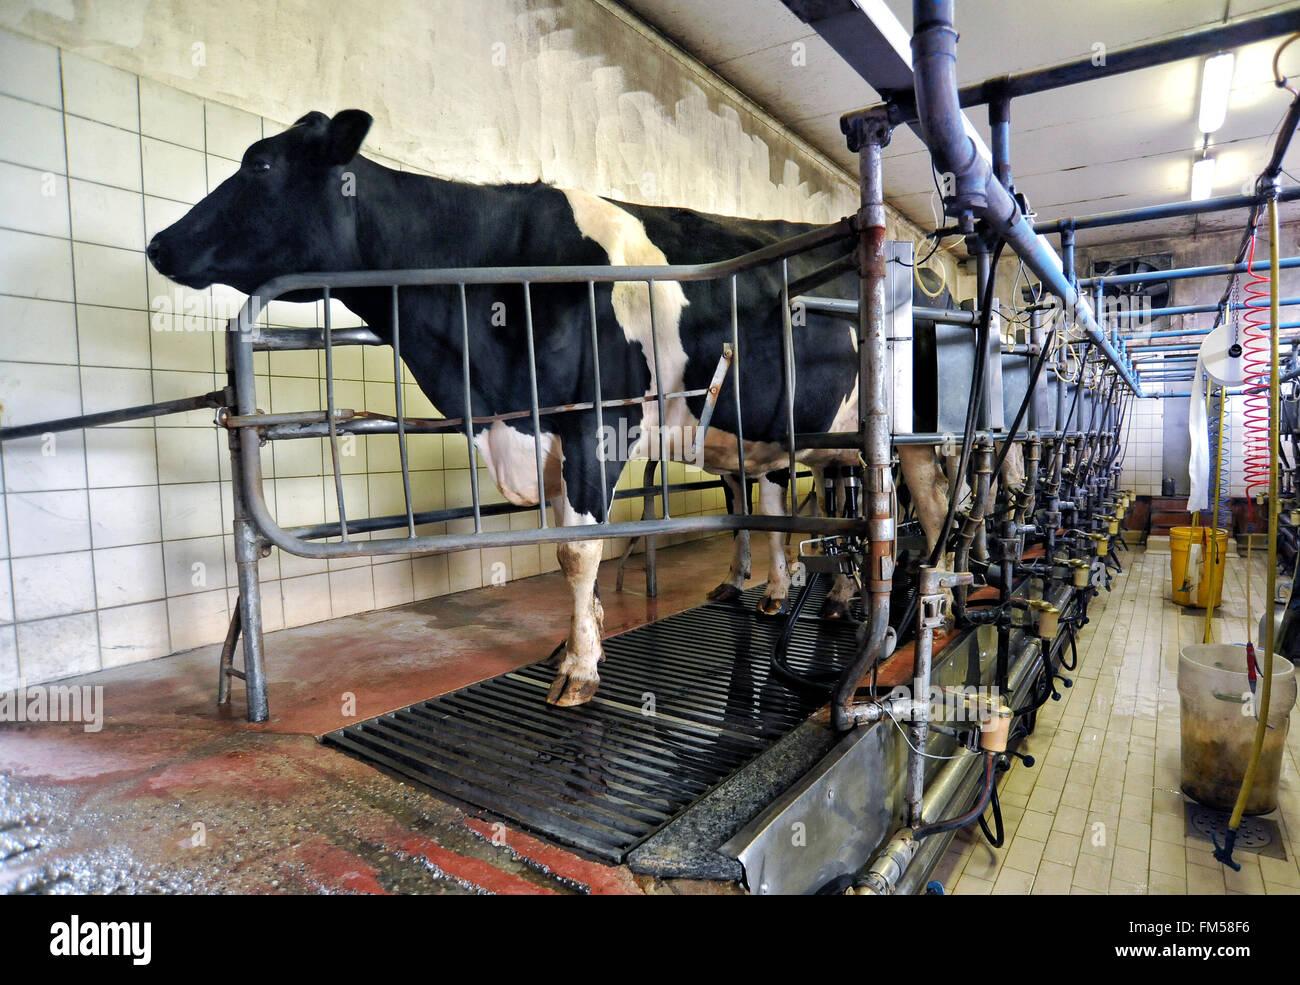 Holstein vacca da latte attaccato a una macchina di mungitura in un sistema automatizzato di una sala mungitura Immagini Stock